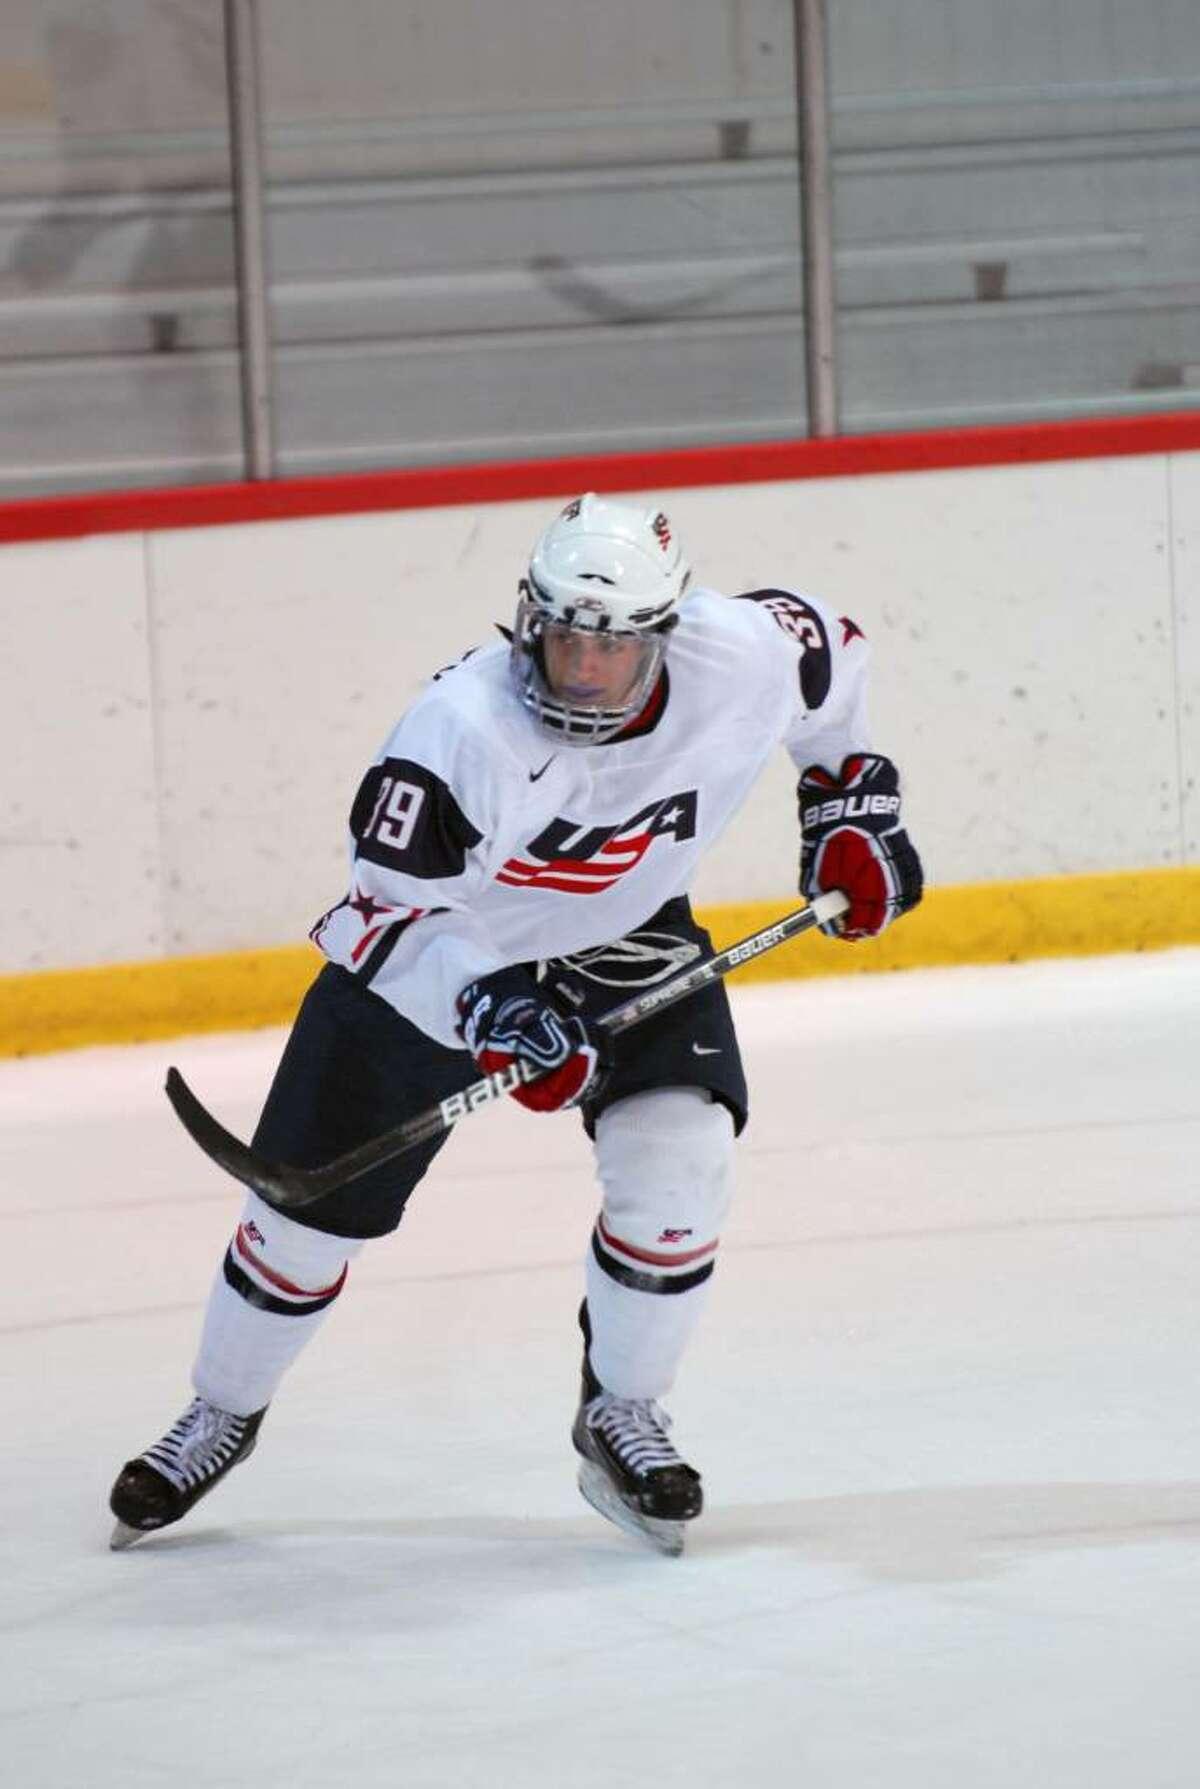 Stamford's Ryan Haggerty is playing for U-17 USA Hockey National Development team.